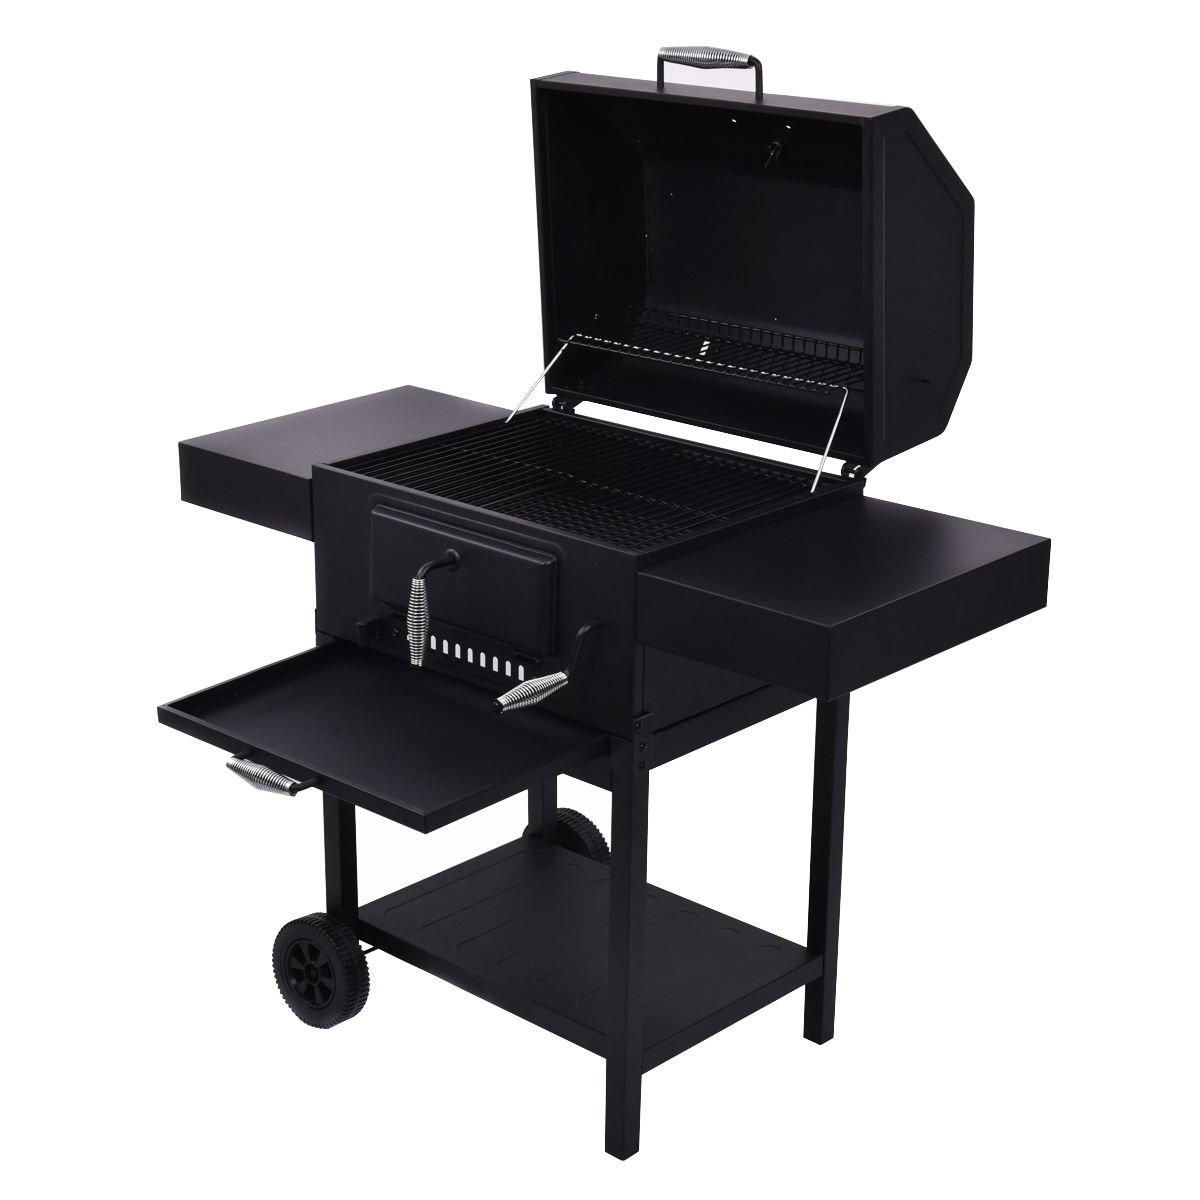 amazon com giantex outdoor charcoal bbq grill backyard barbecue